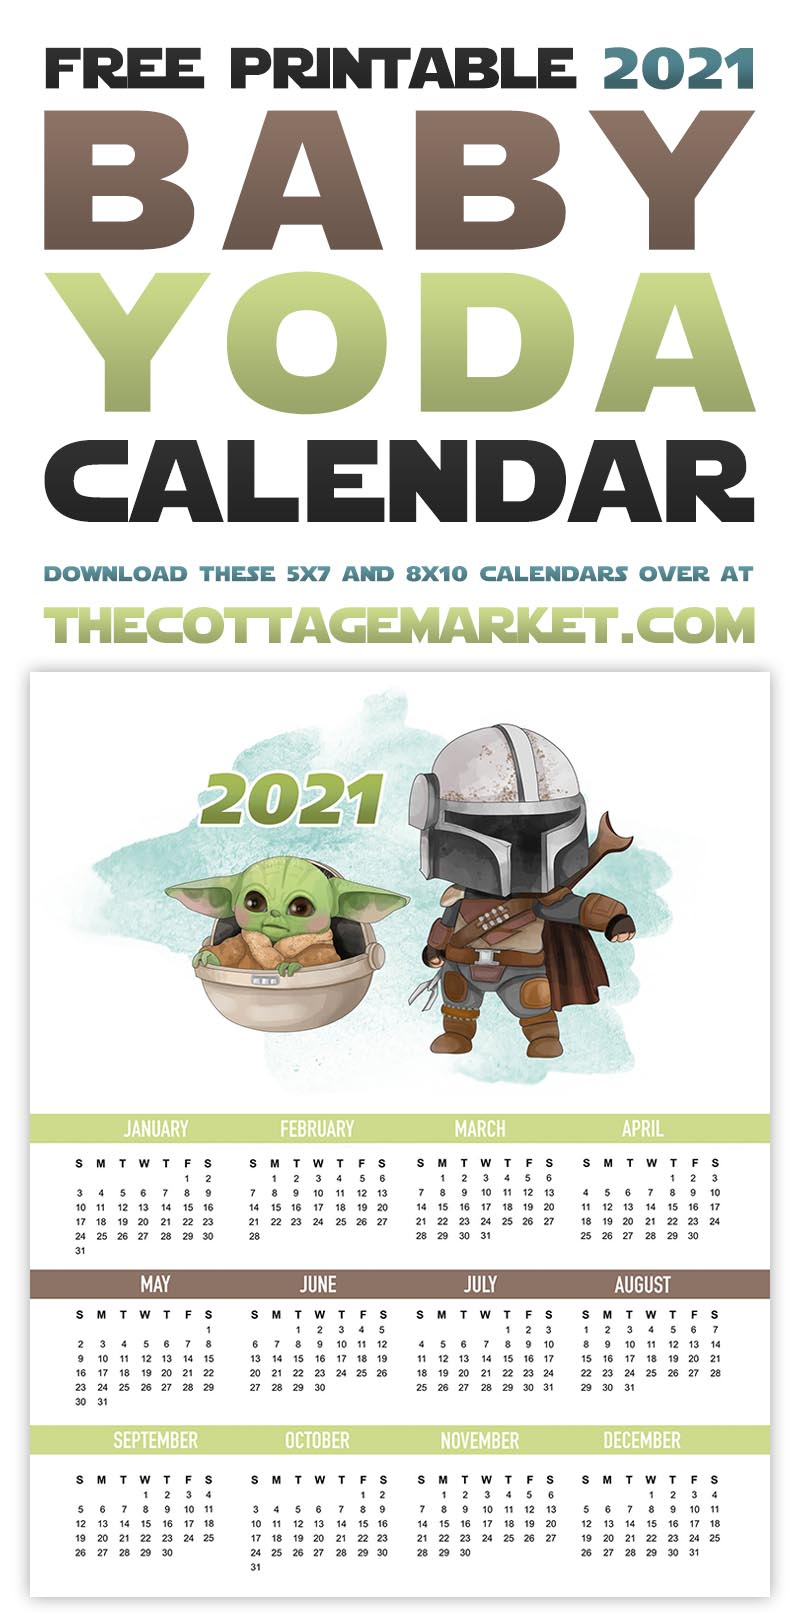 https://thecottagemarket.com/wp-content/uploads/2020/10/tcm-2021-BabyYoda-onepage-calendar-tower-2.jpg